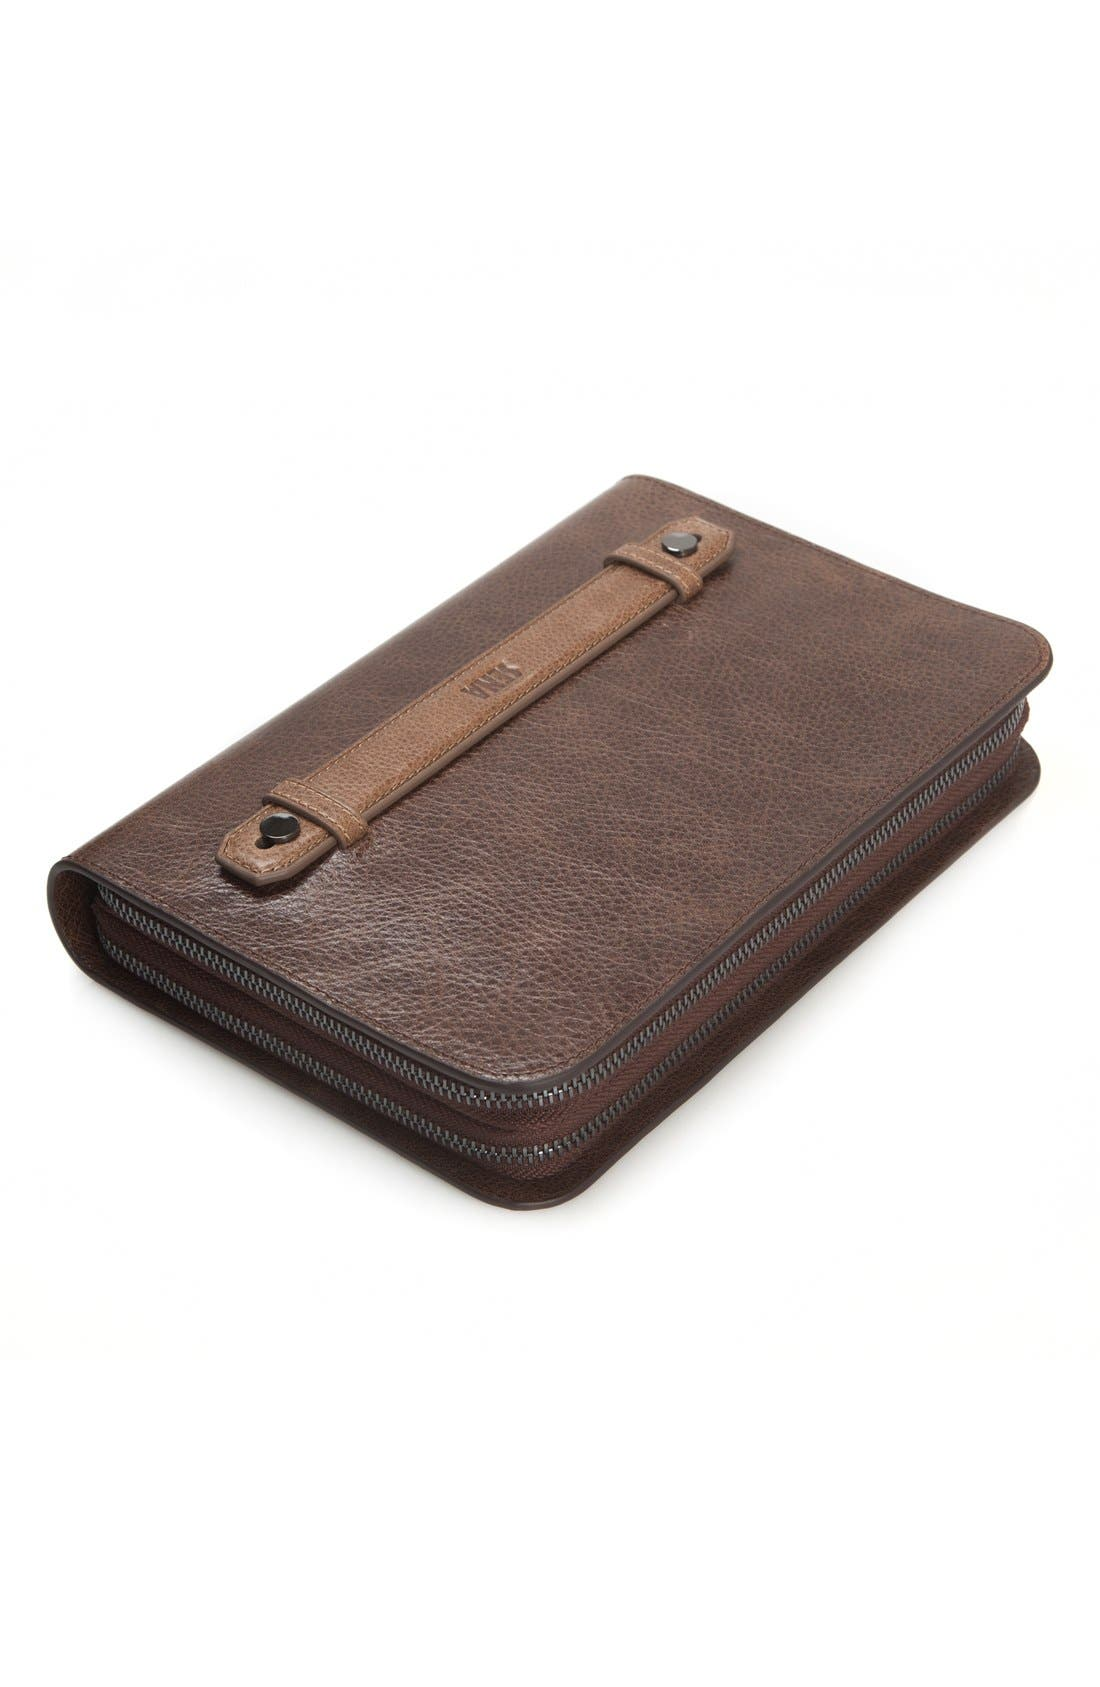 SENA 'Heritage' iPad mini All-in-One Case, Main, color, 213